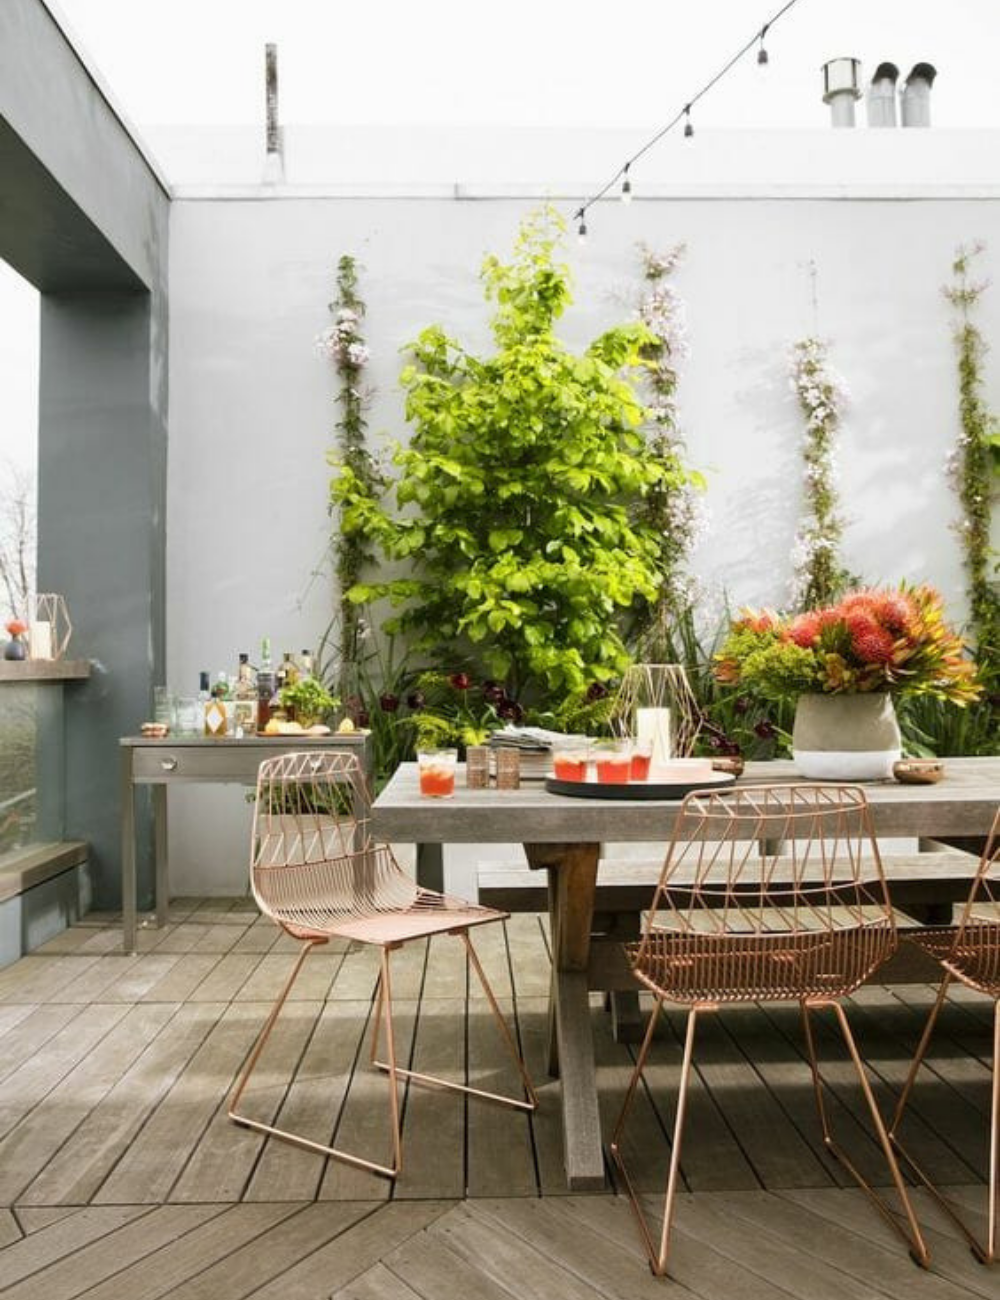 summer interior design trends 6 IMPRESSIVE SUMMER INTERIOR DESIGN TRENDS FOR YOUR HOME 2